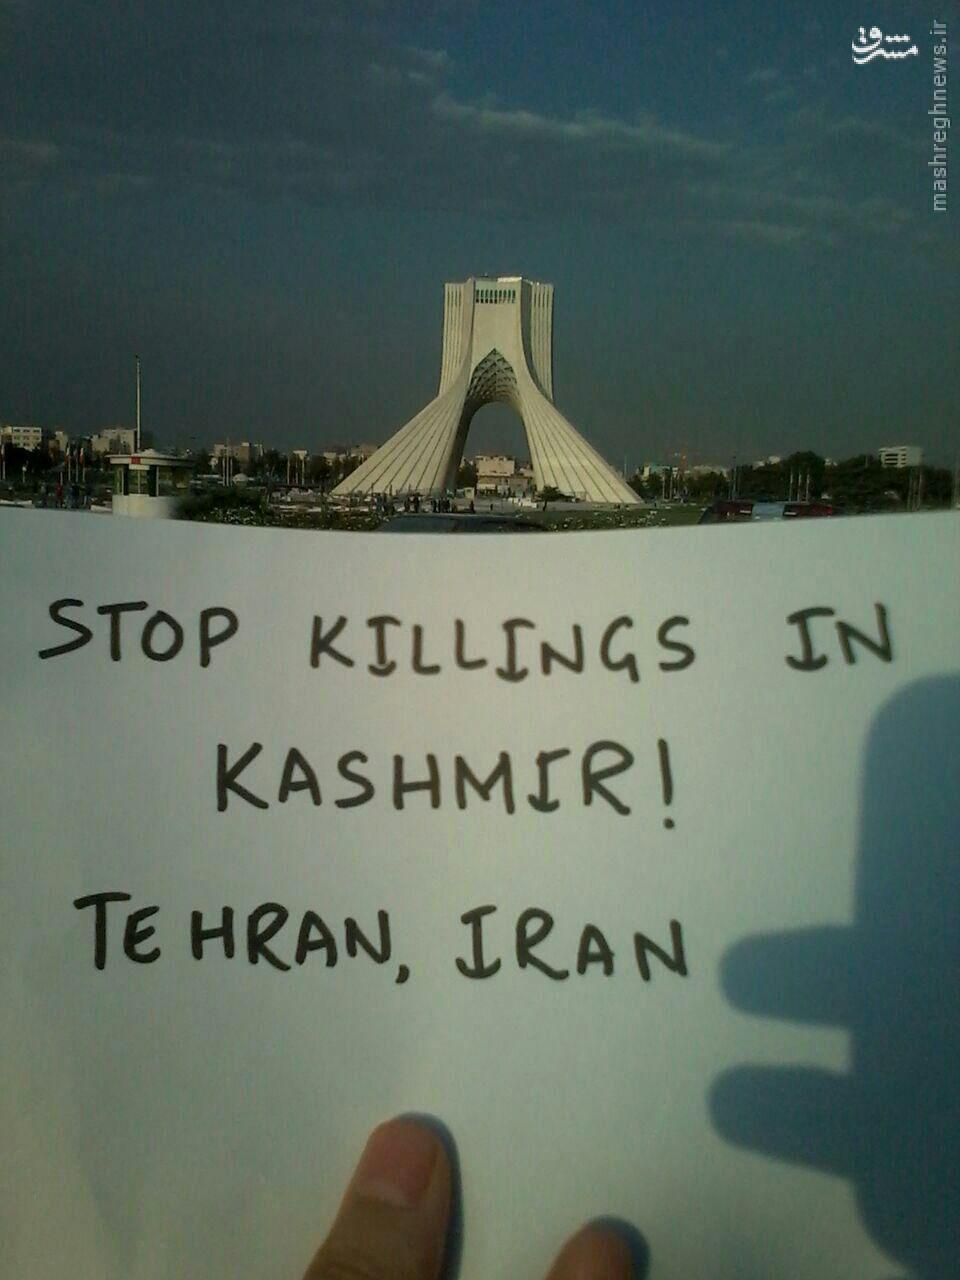 عکس/ کمپین حمایت از مسلمانان کشمیر